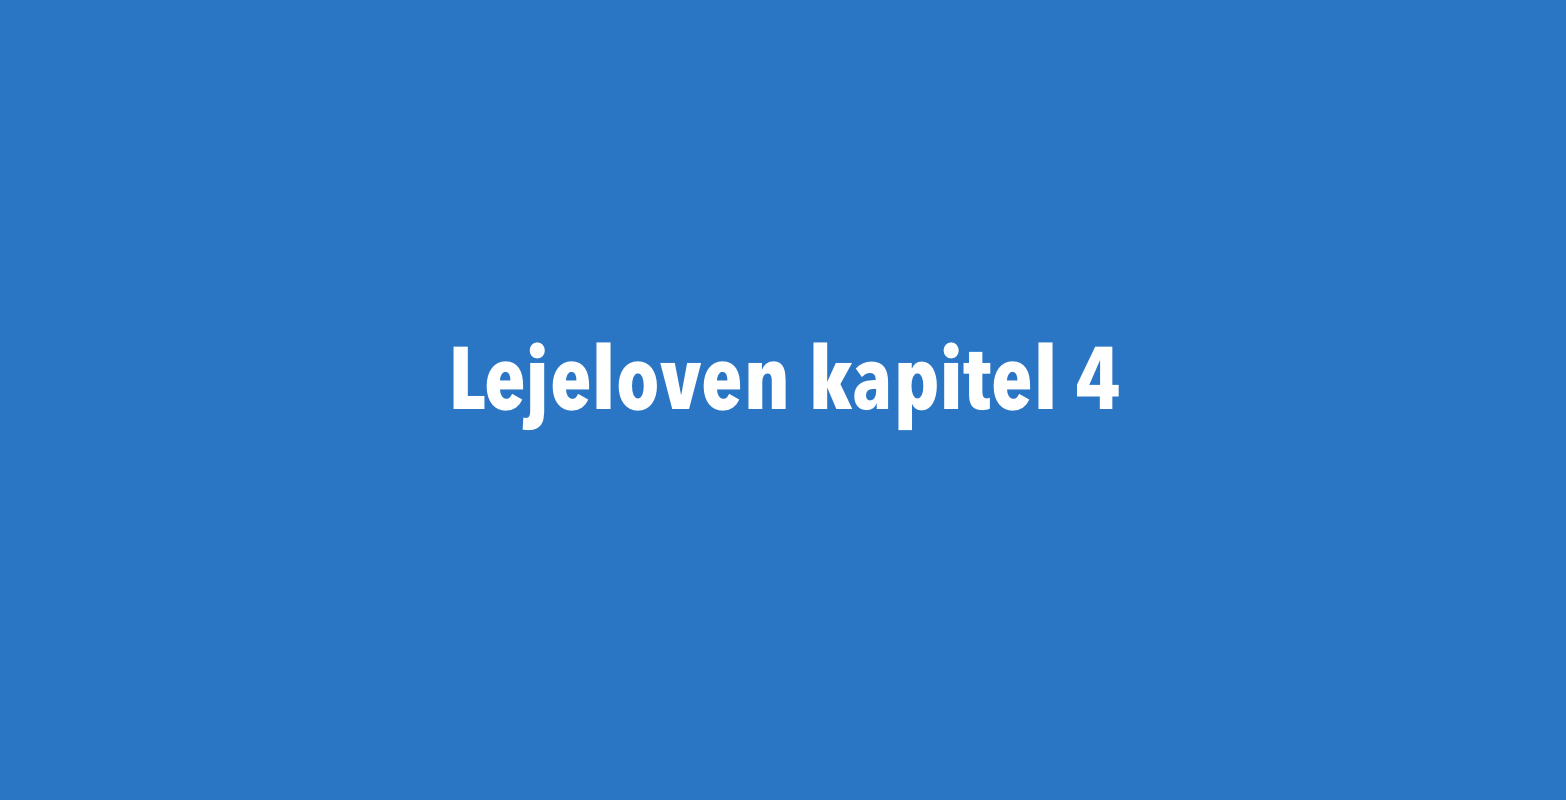 Lejelovens kapital 4